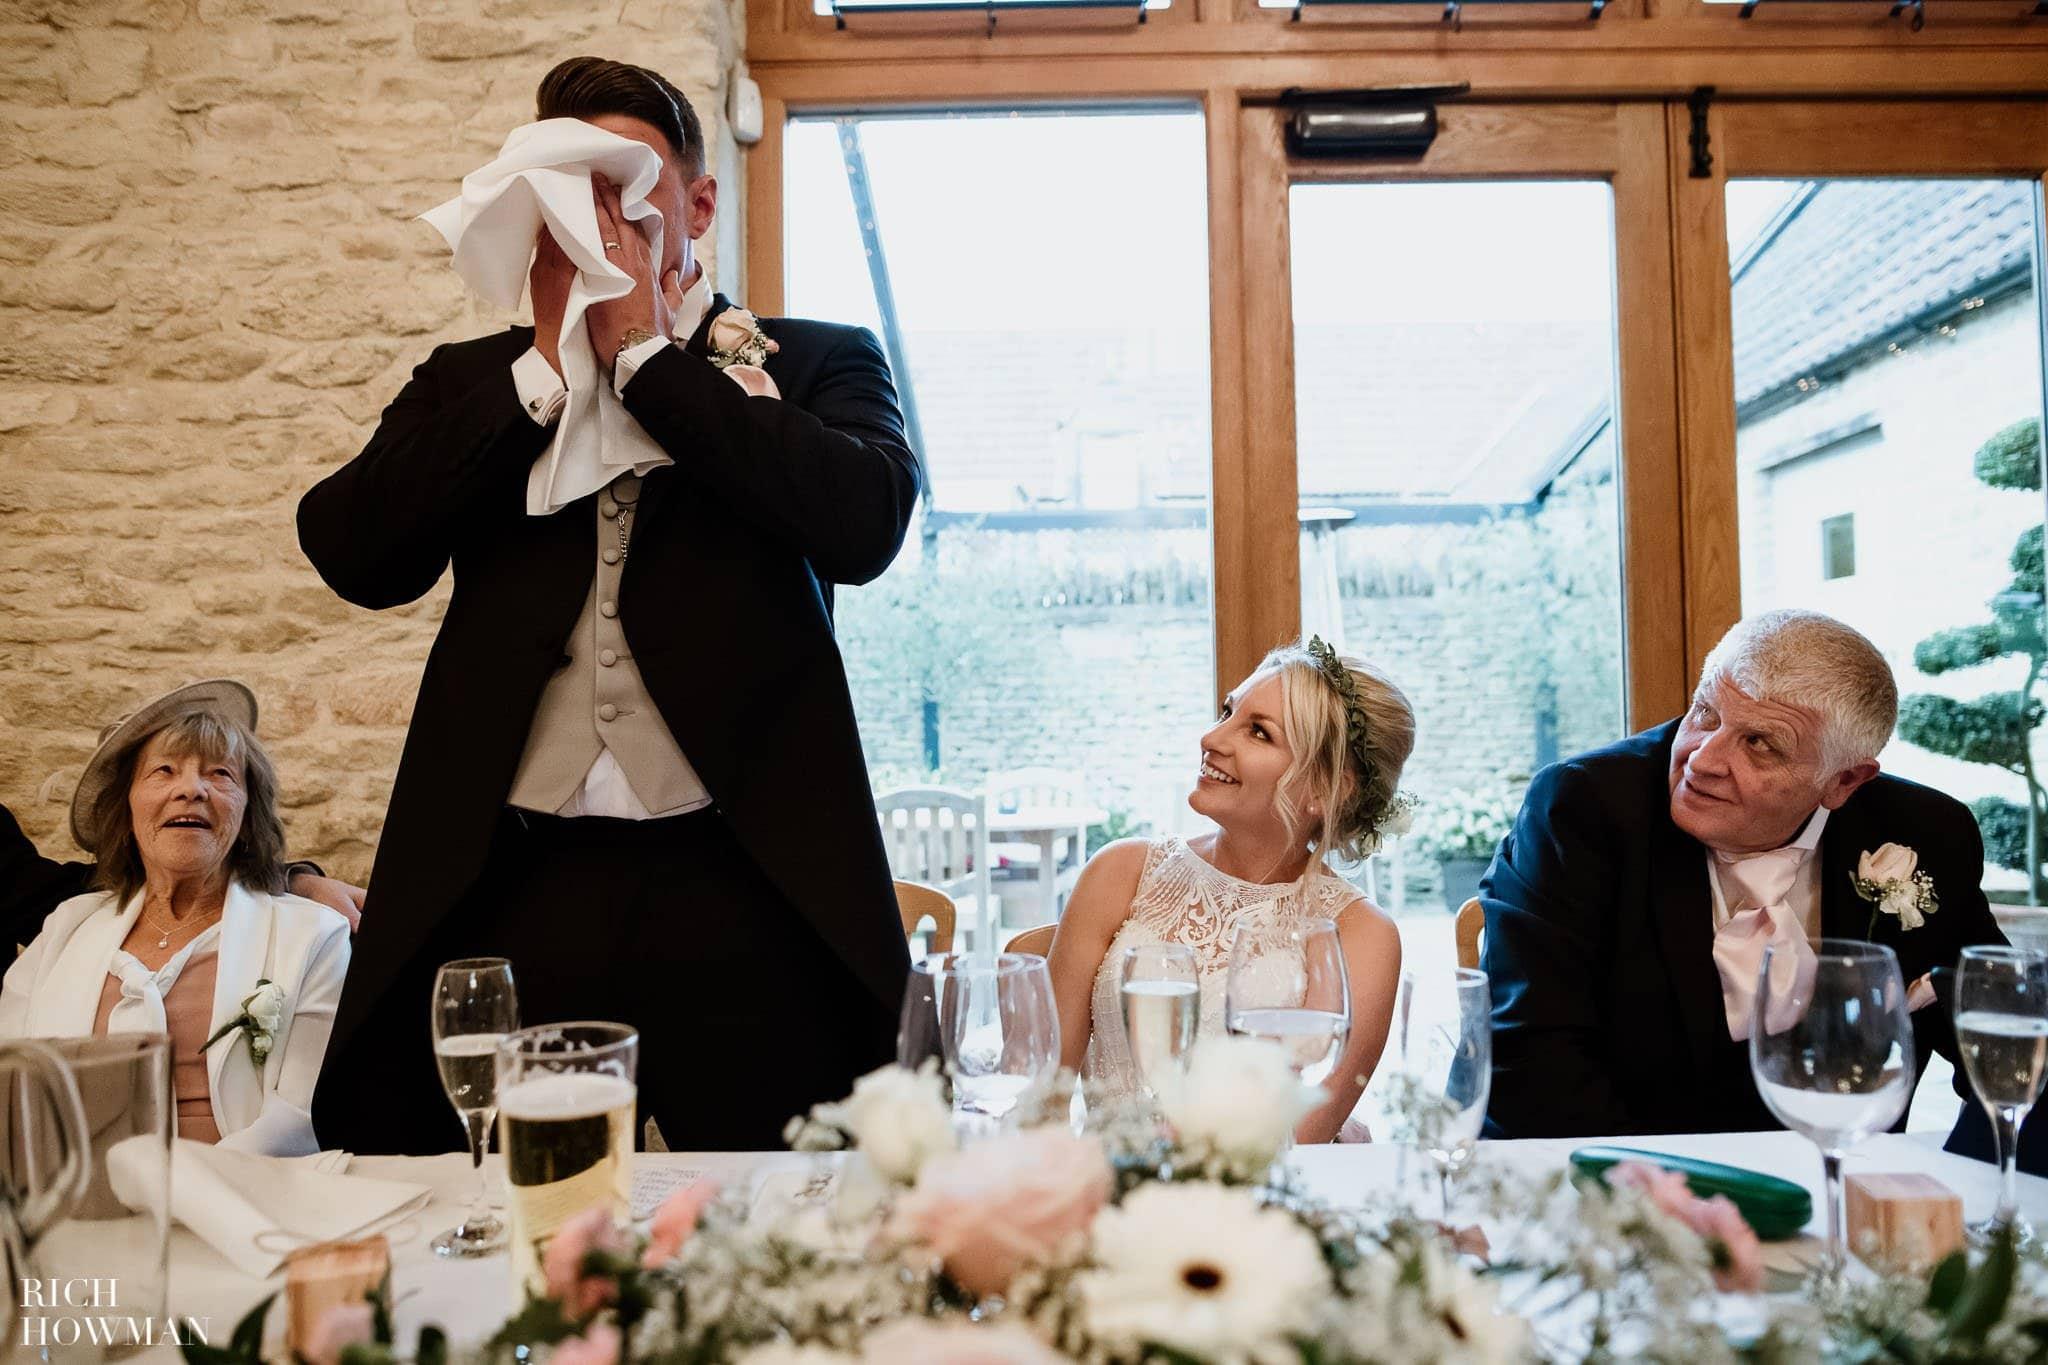 Kingscote Barn Wedding Photographer in Gloucestershire 583